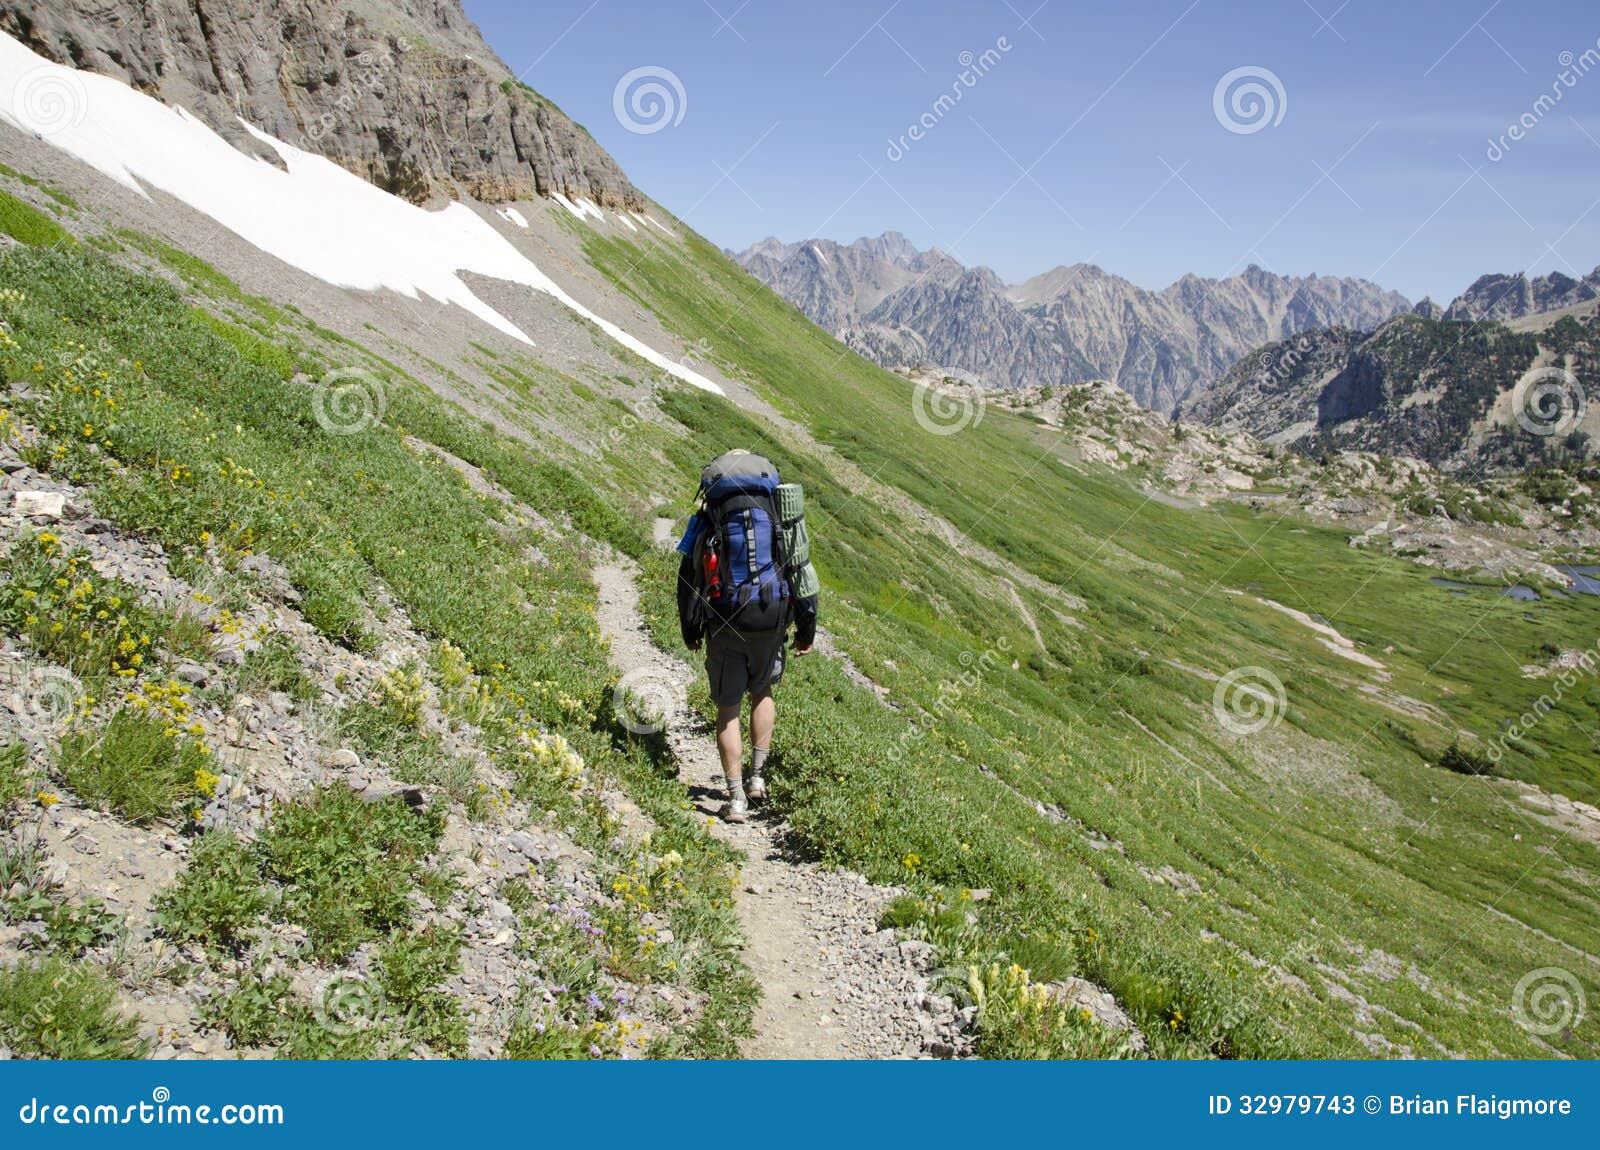 Hiking Teton Crest